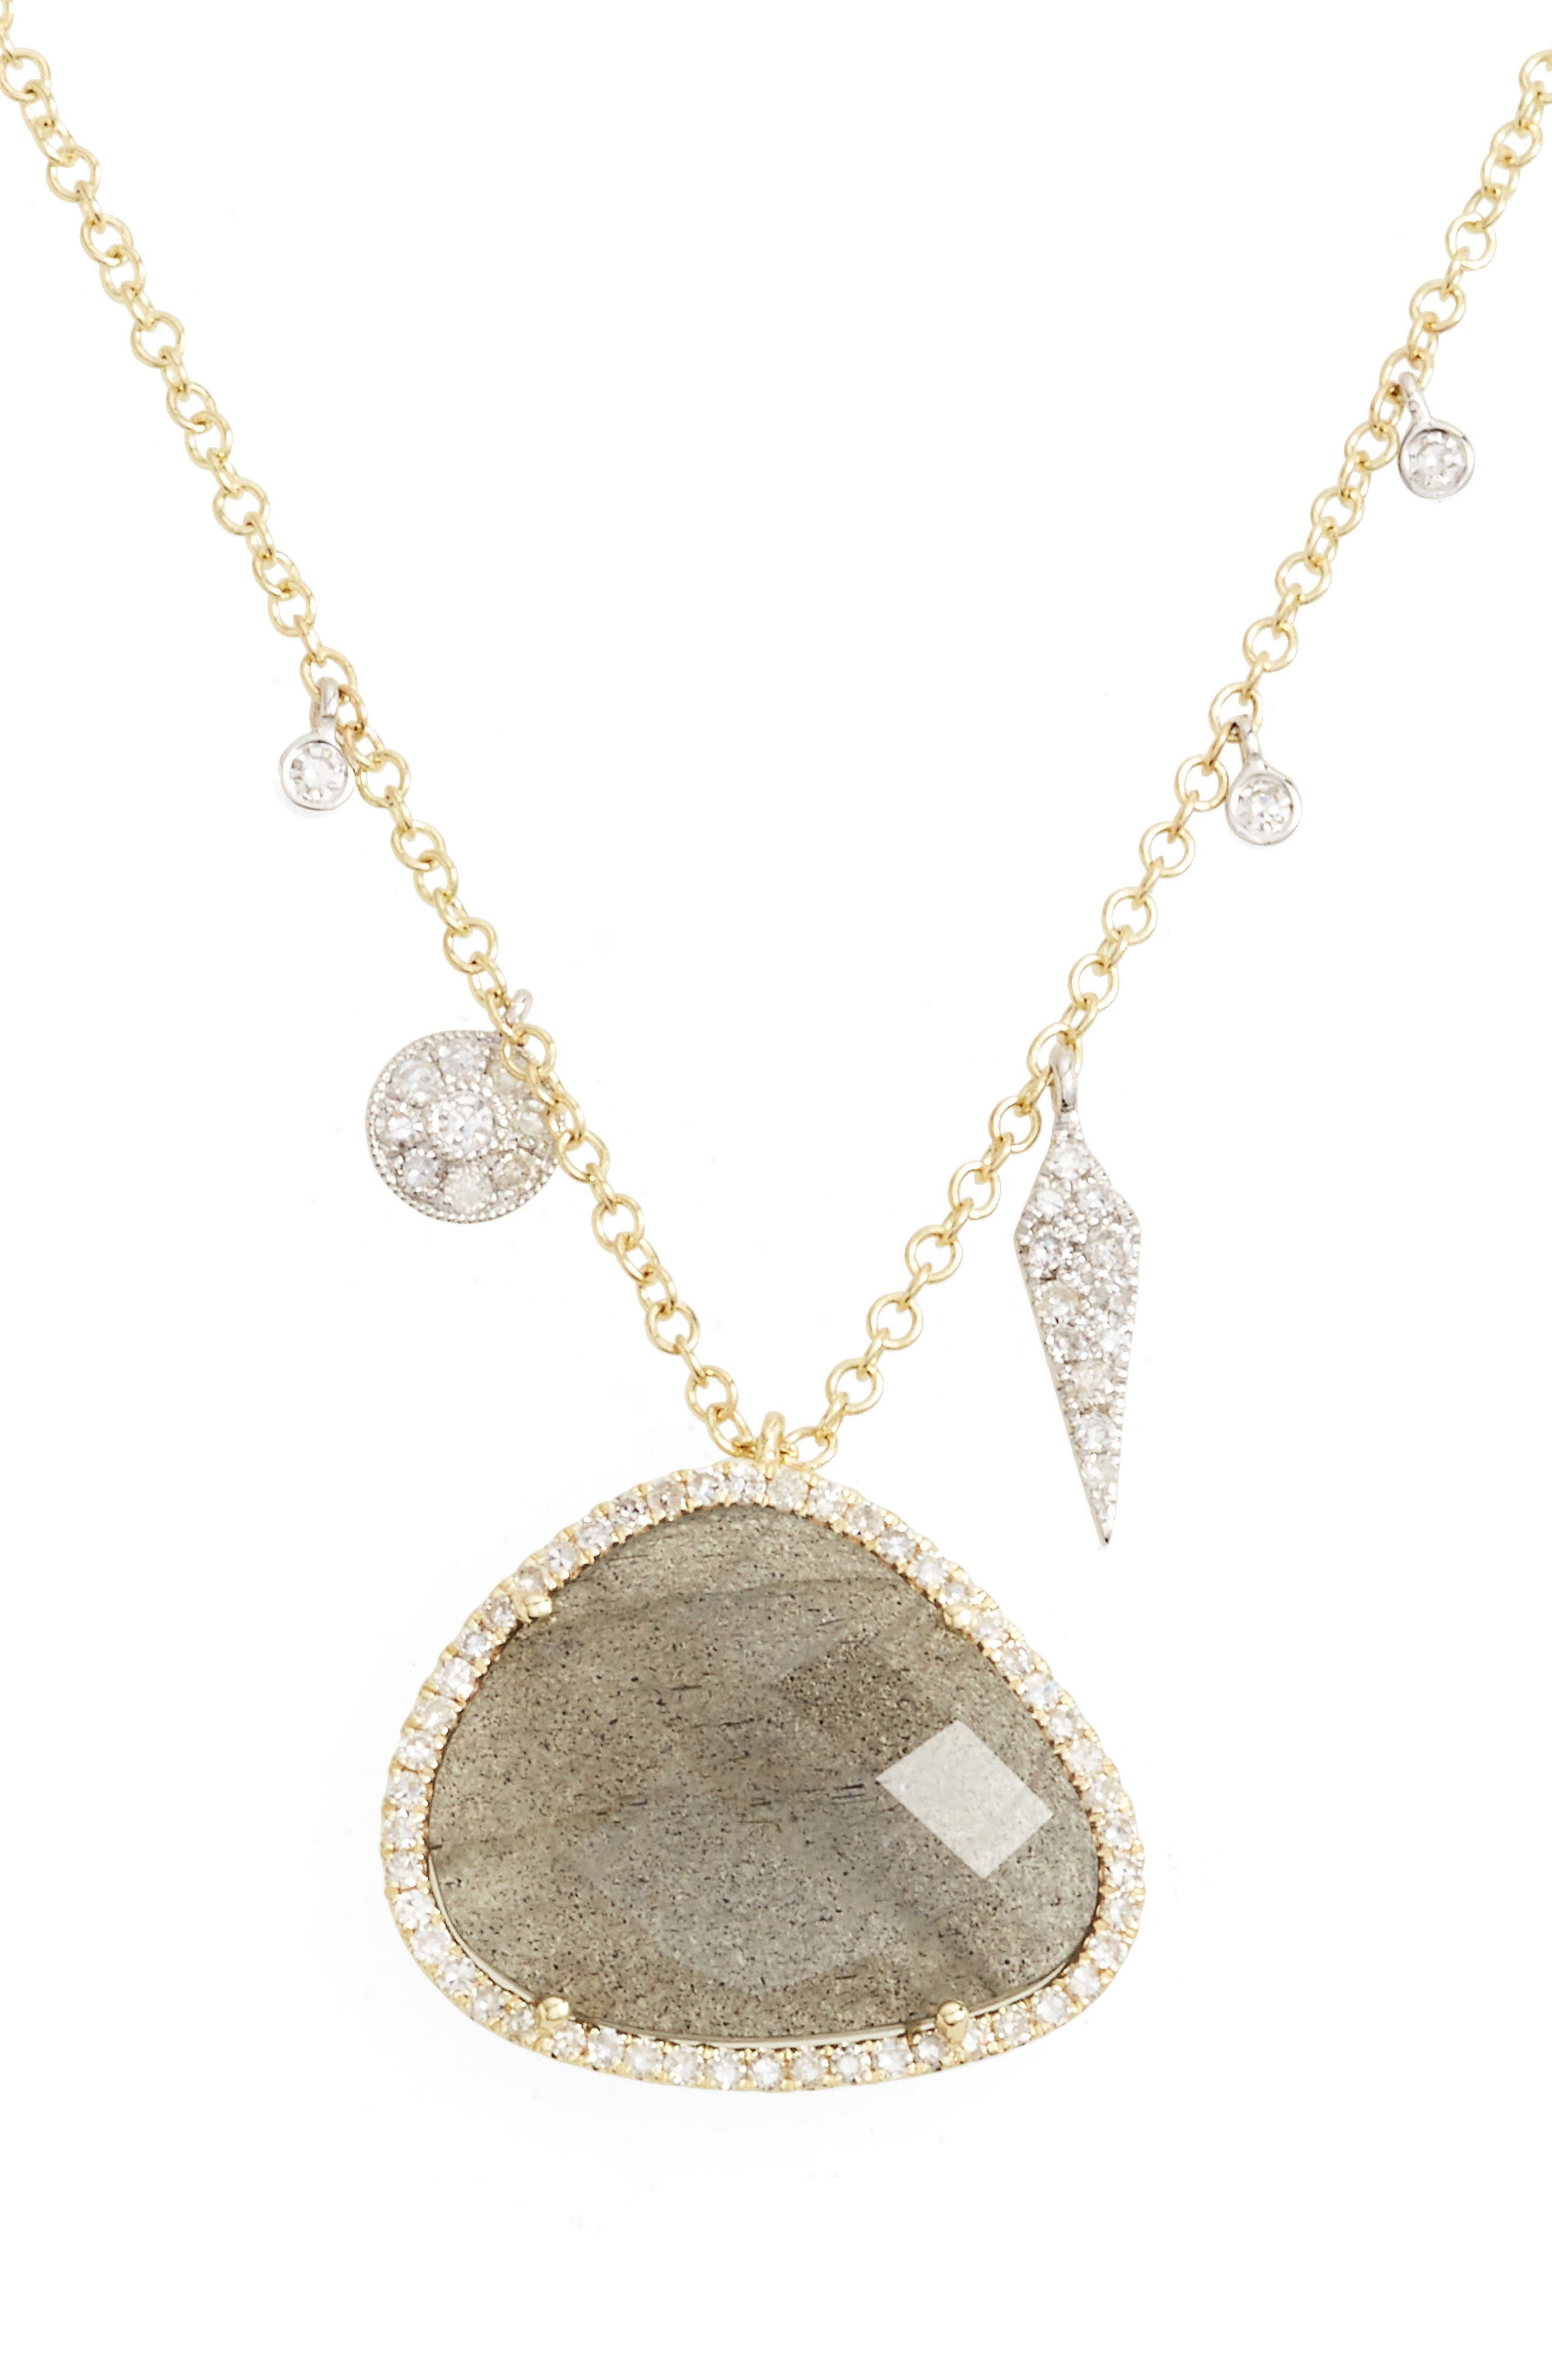 Jewelry Diamond & Semiprecious Stone Pendant Necklace,                             Main thumbnail 1, color,                             Yellow Gold/ Labradorite